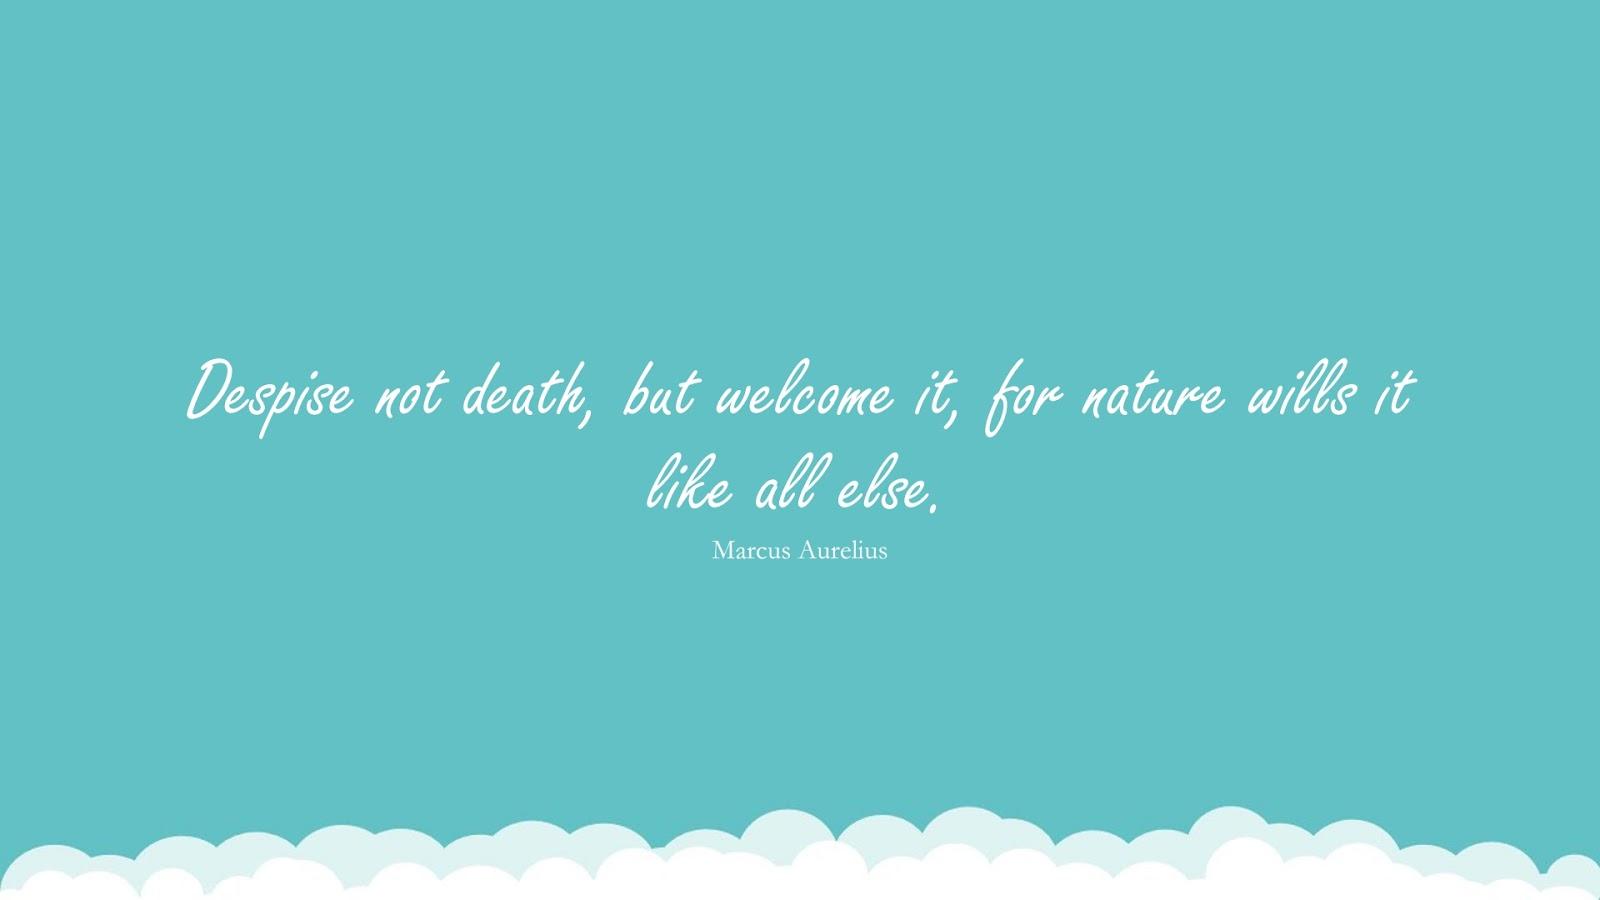 Despise not death, but welcome it, for nature wills it like all else. (Marcus Aurelius);  #MarcusAureliusQuotesandSayings